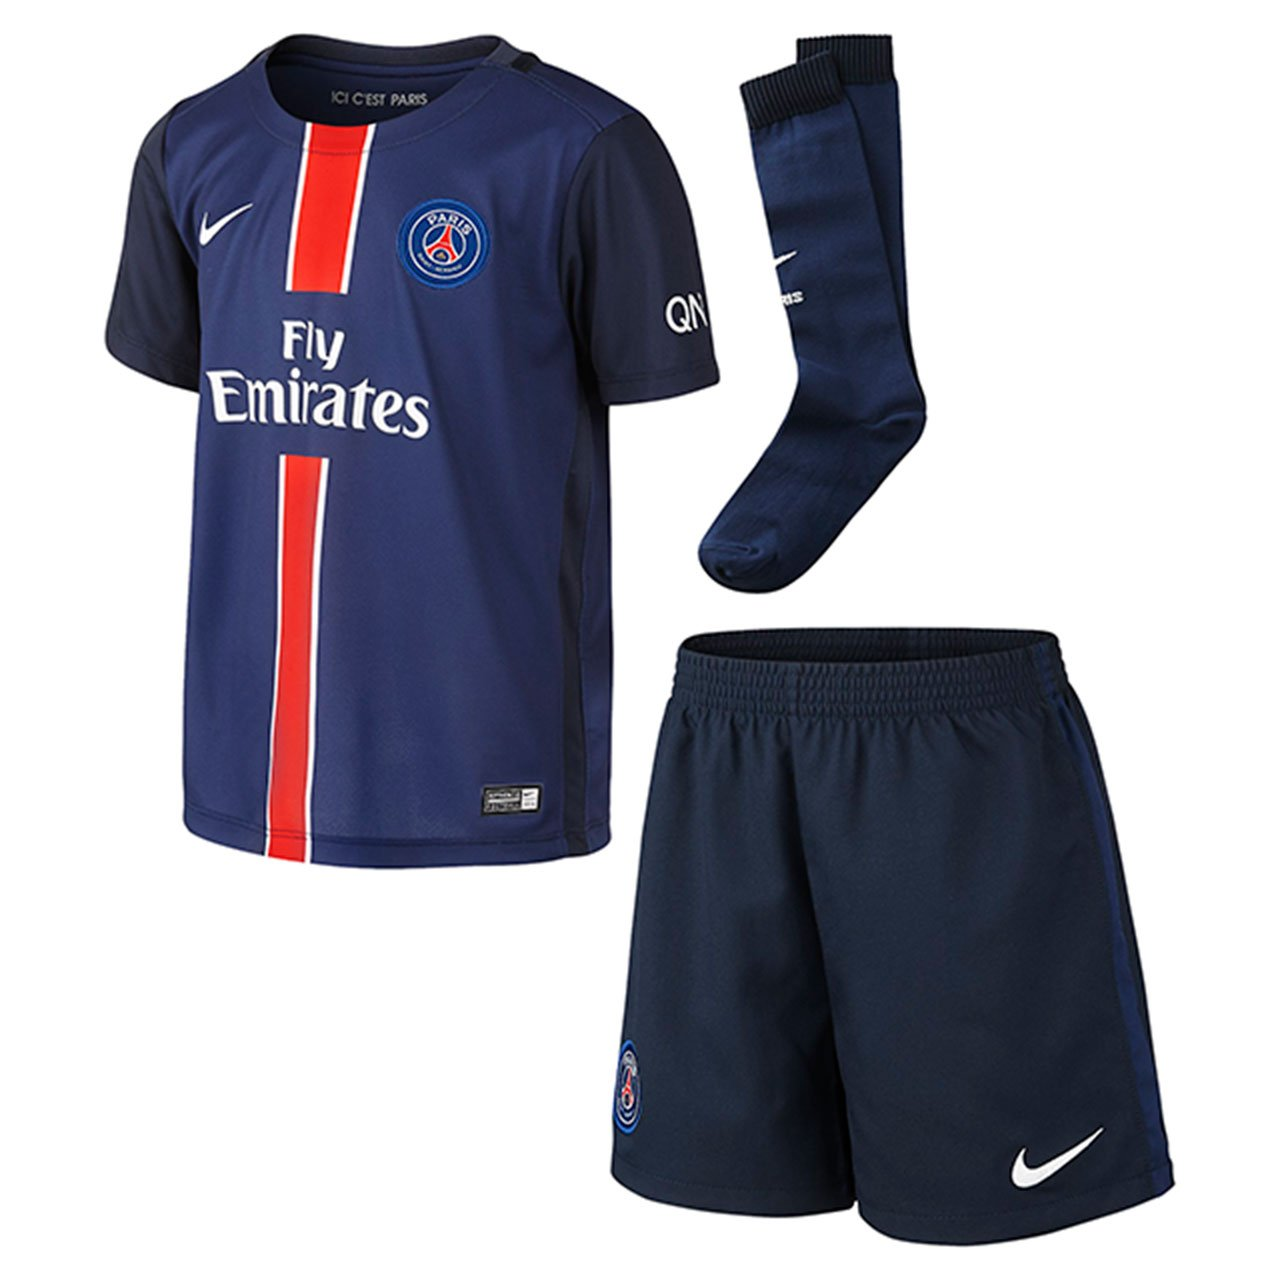 a851df15d26 Amazon.com : Nike Paris-Saint Germain Home Pre-School Boys' Soccer